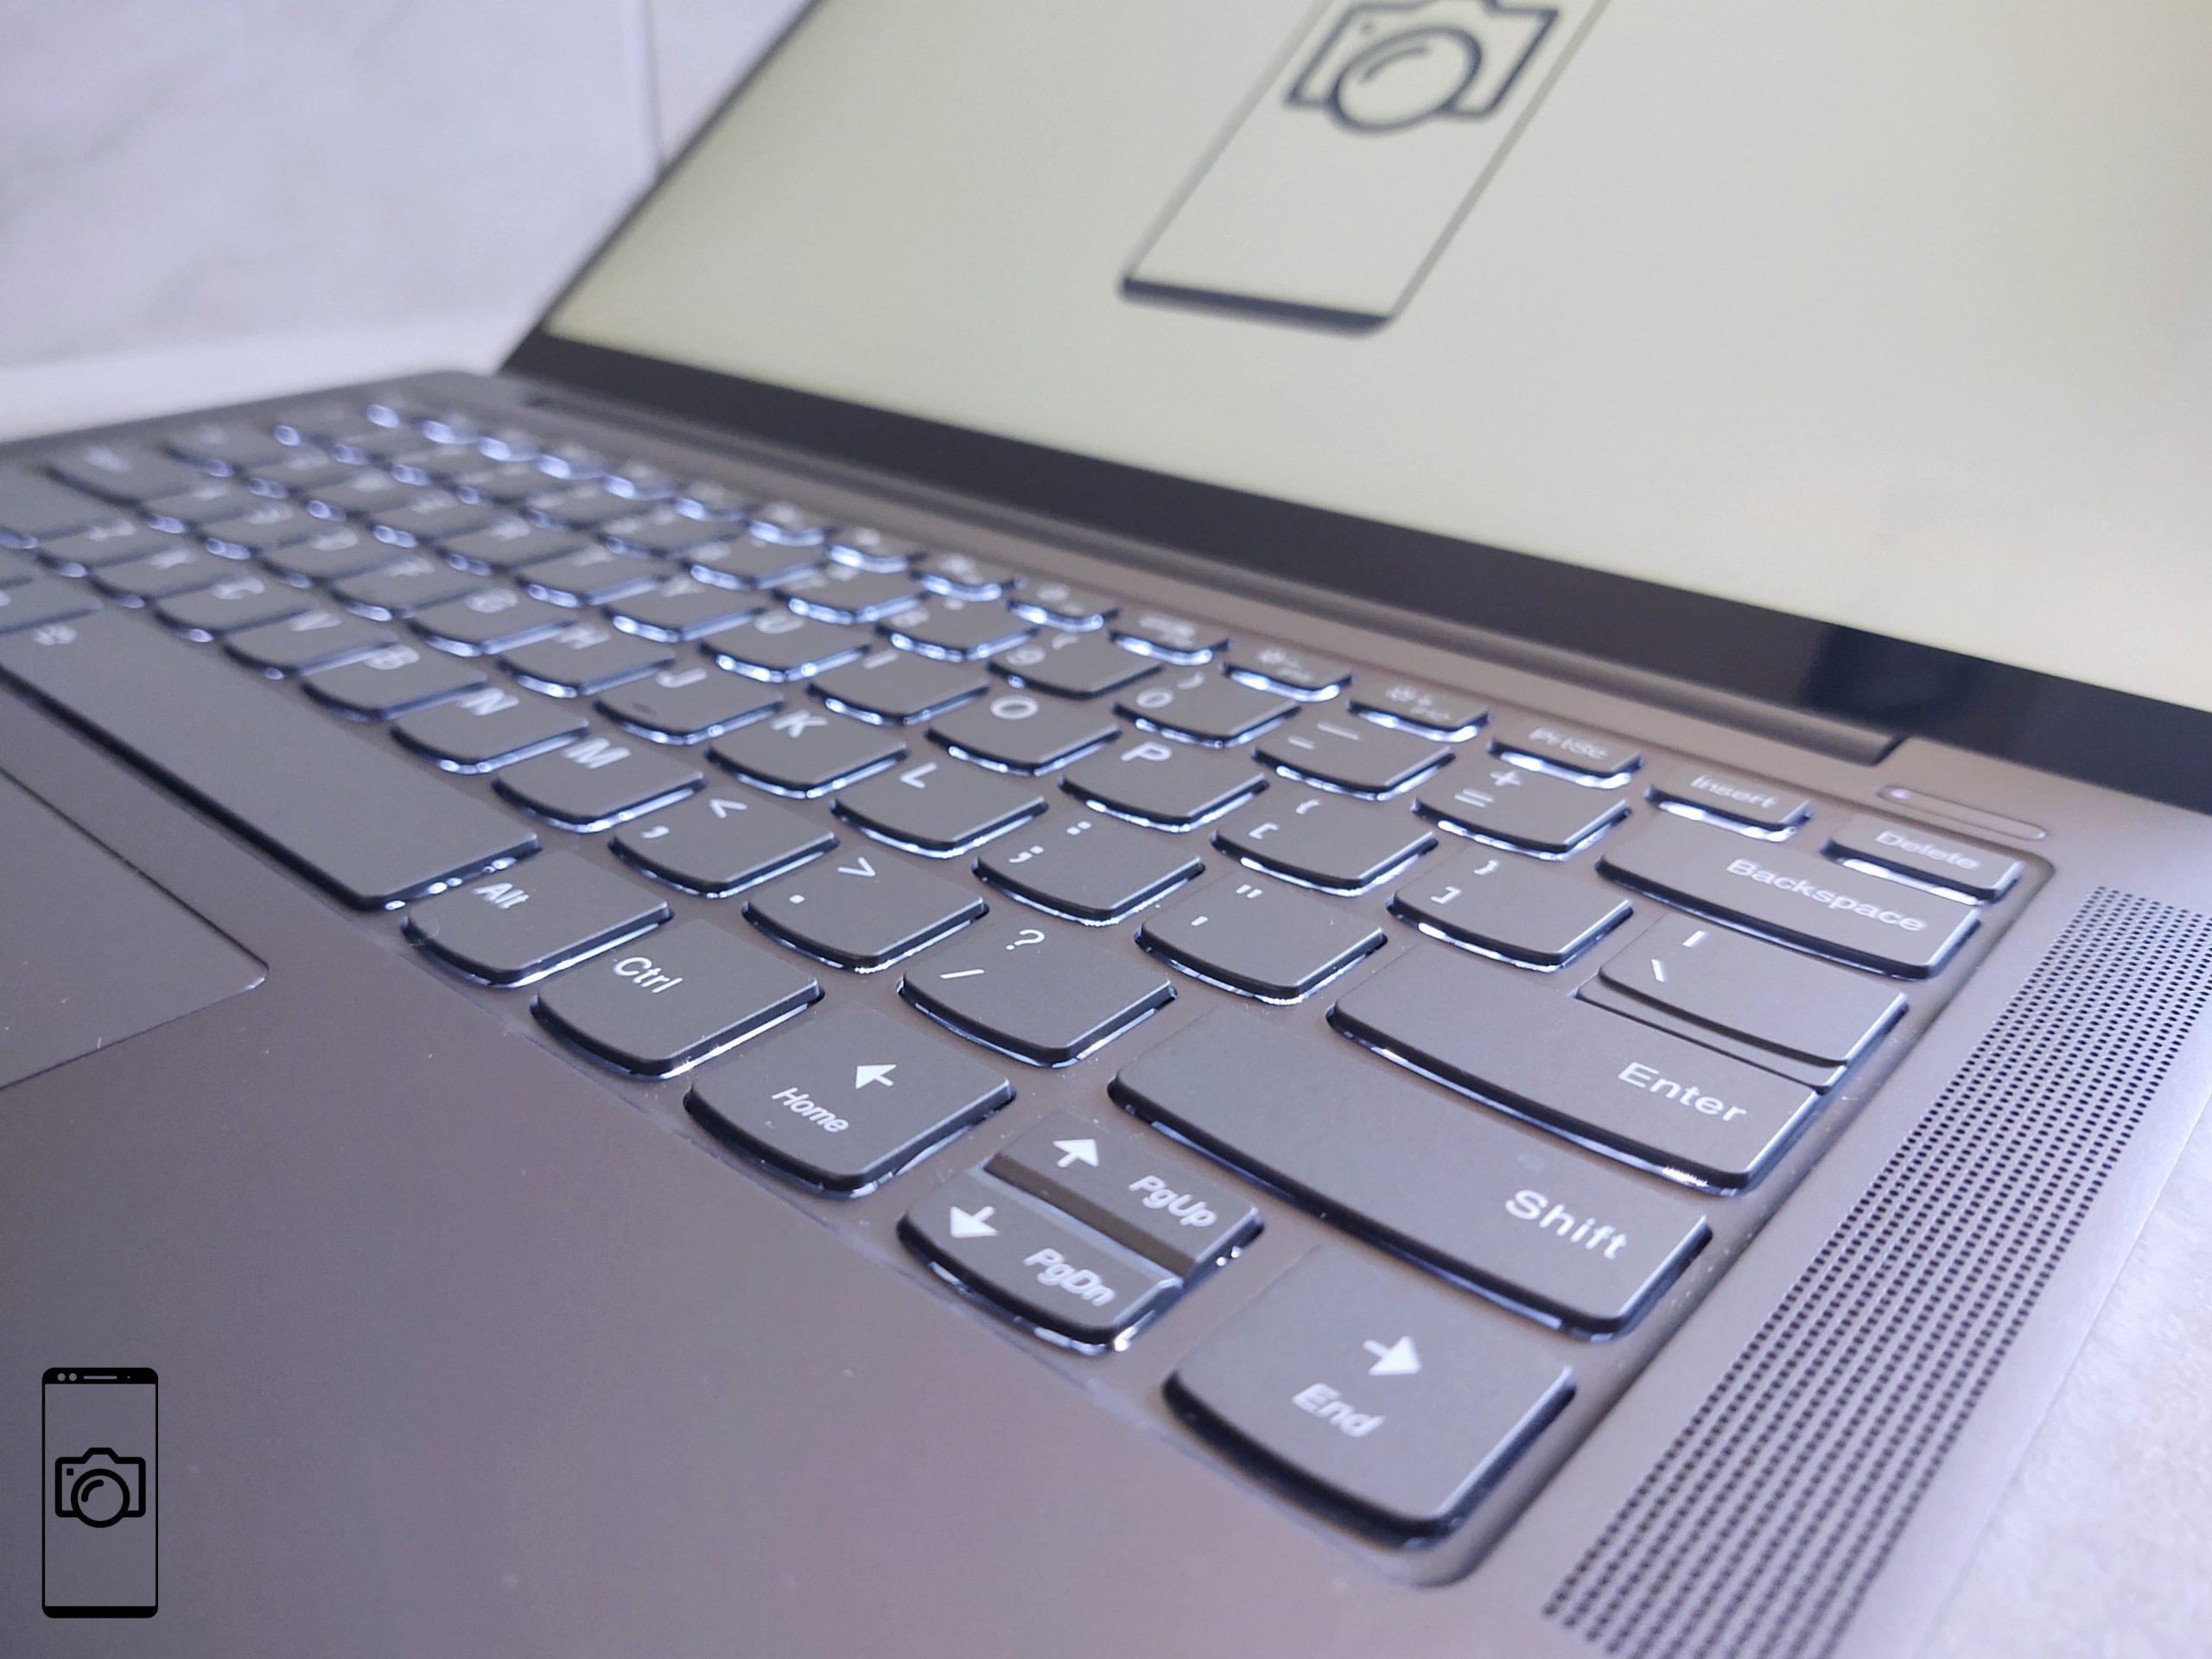 Lenovo Yoga S740